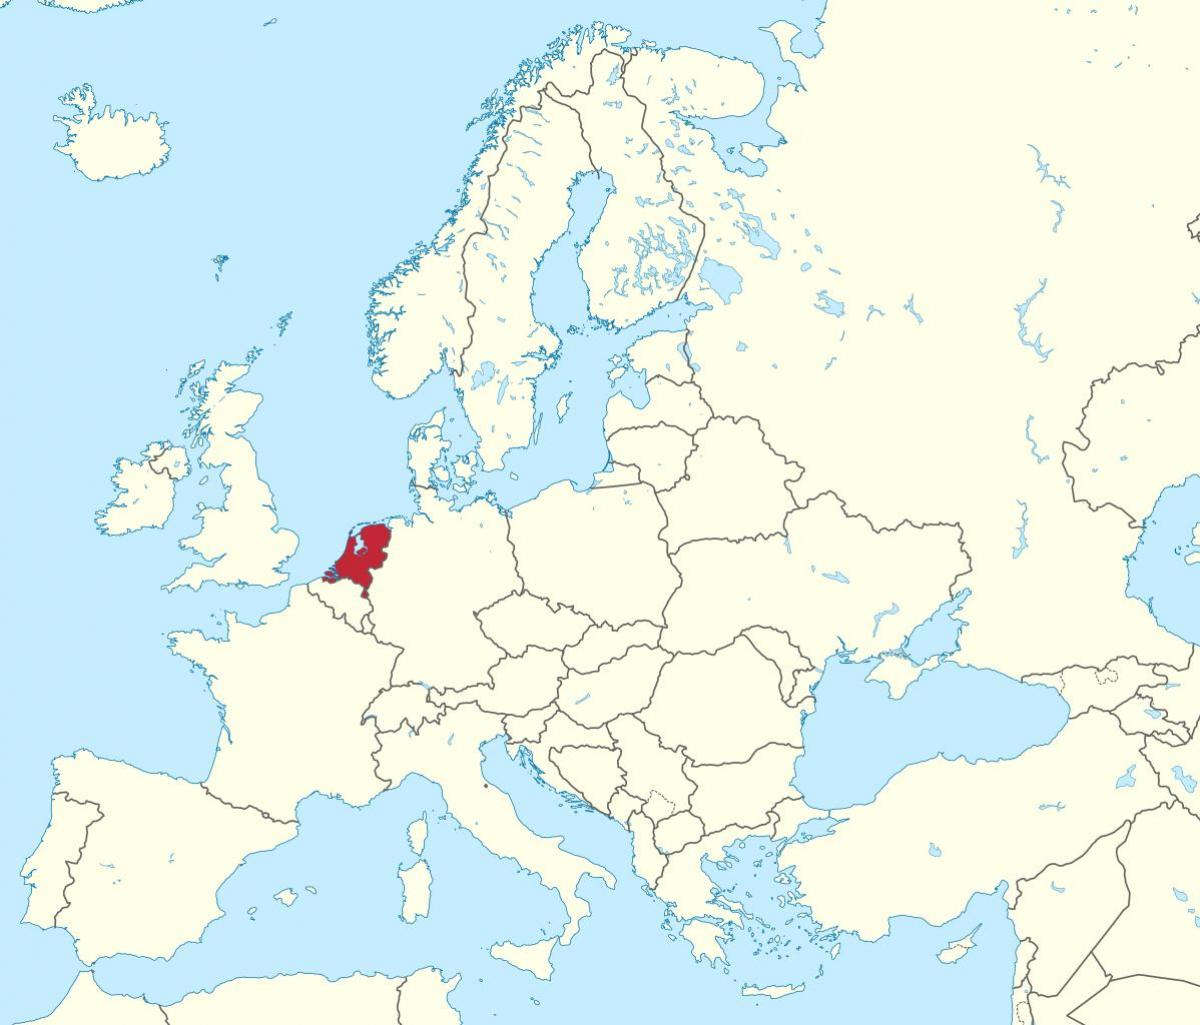 Carte De Leurope Pays Bas.Carte De L Europe Pays Bas Pays Bas Carte Europe Europe